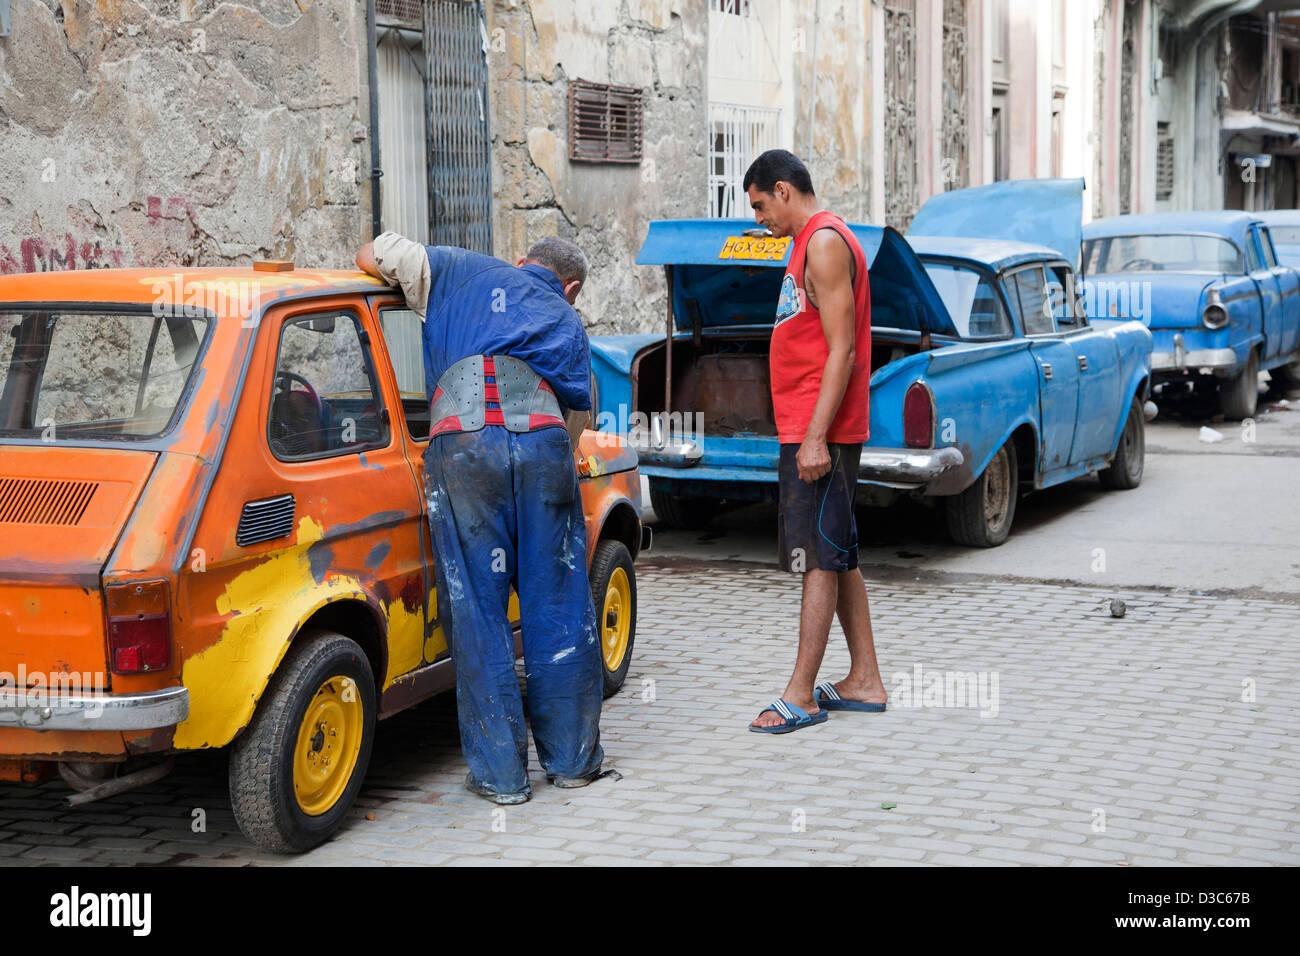 1950s vintage American cars / Yank tank and Cuban car mechanic repairing old car on street in Havana, Cuba, Caribbean - Stock Image